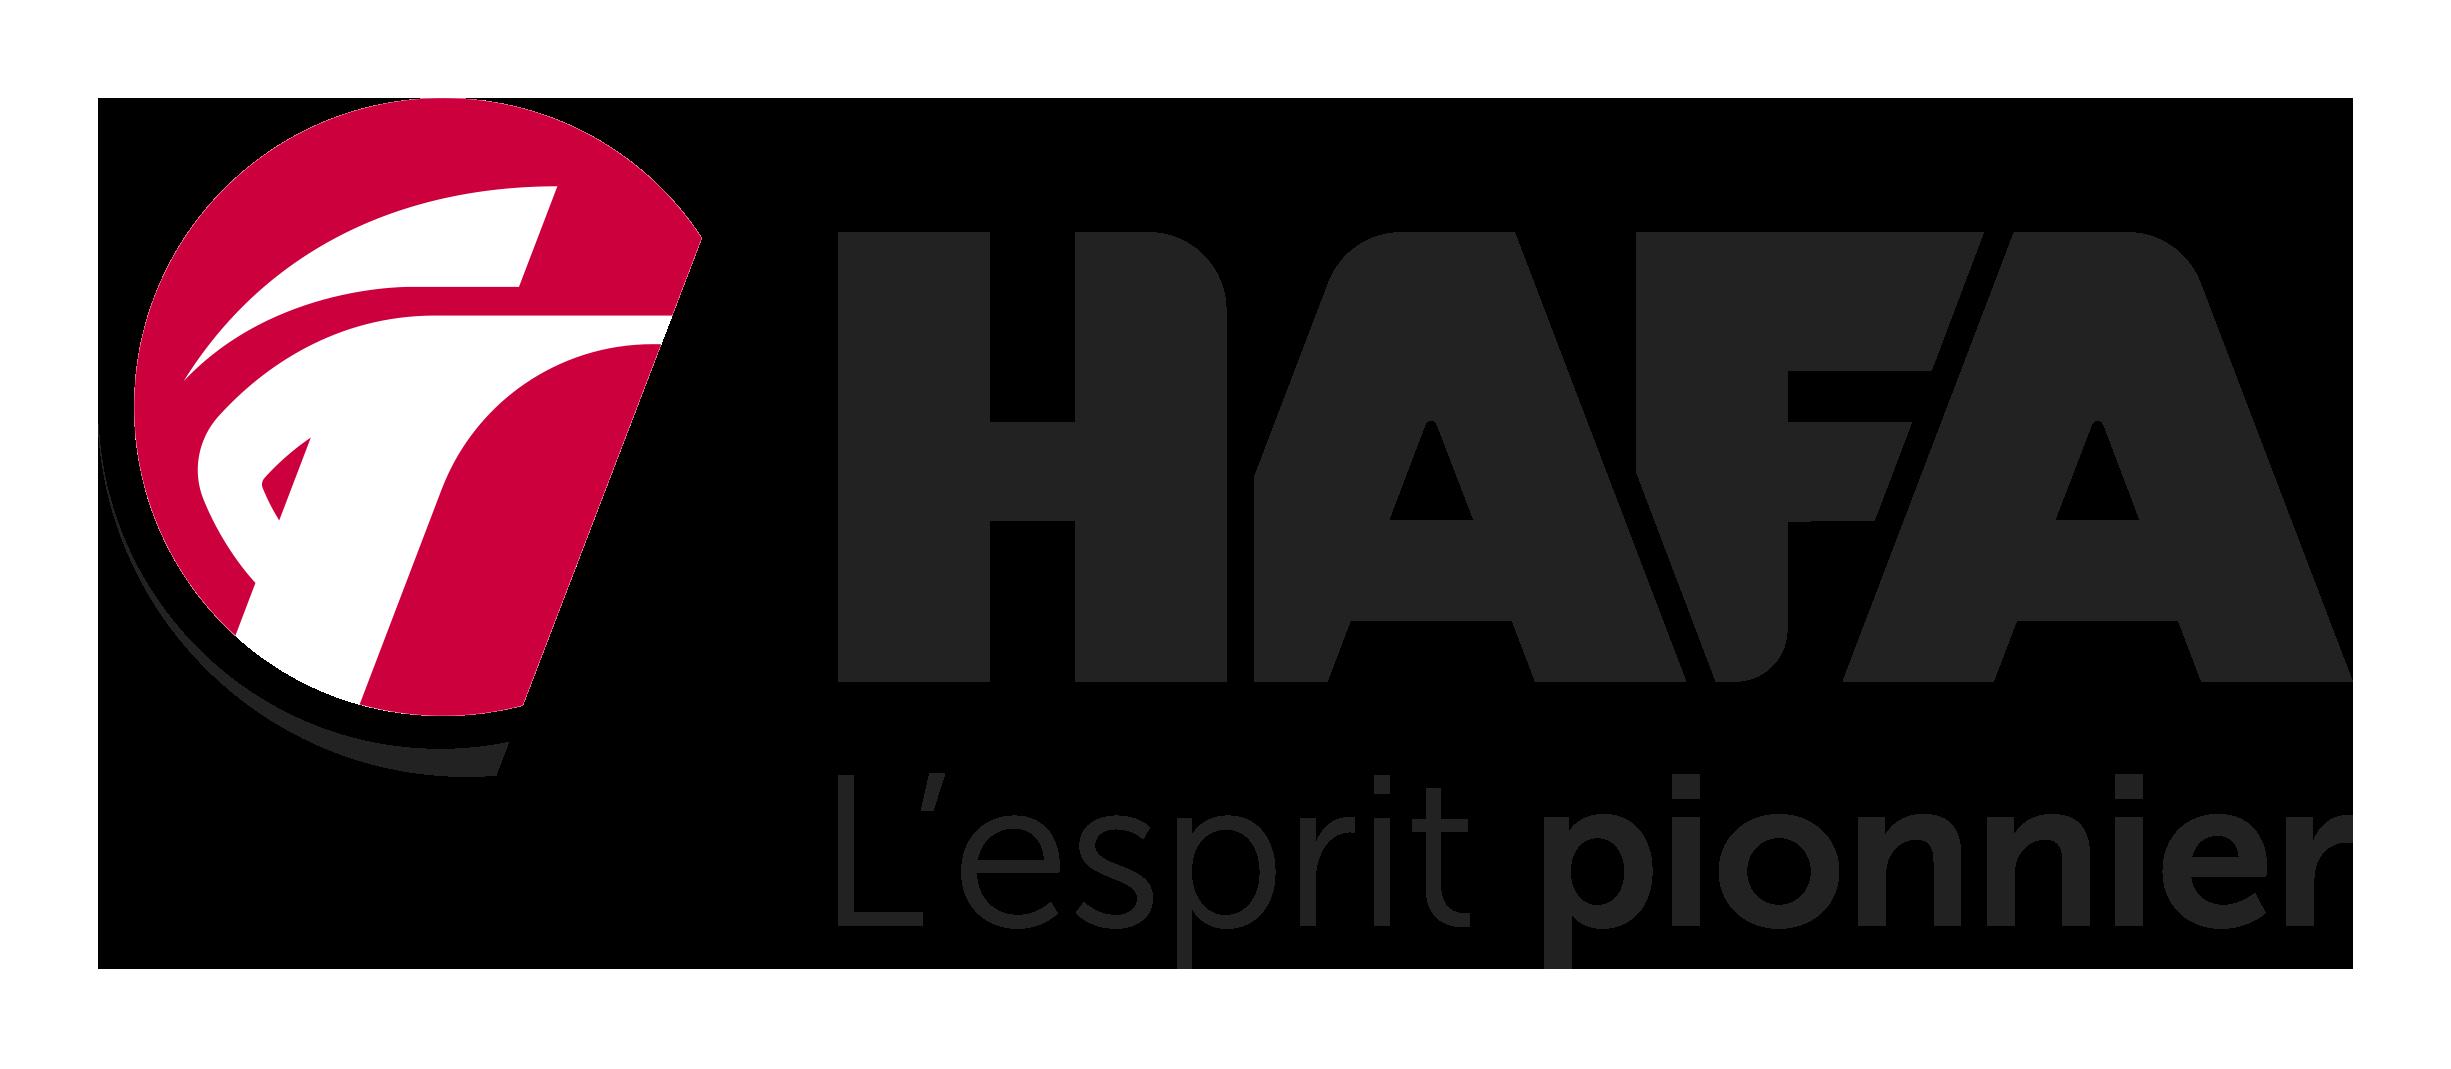 https://rouennormandierugby.fr/wp-content/uploads/2021/04/Hafa_logo_baseline_rvb.png